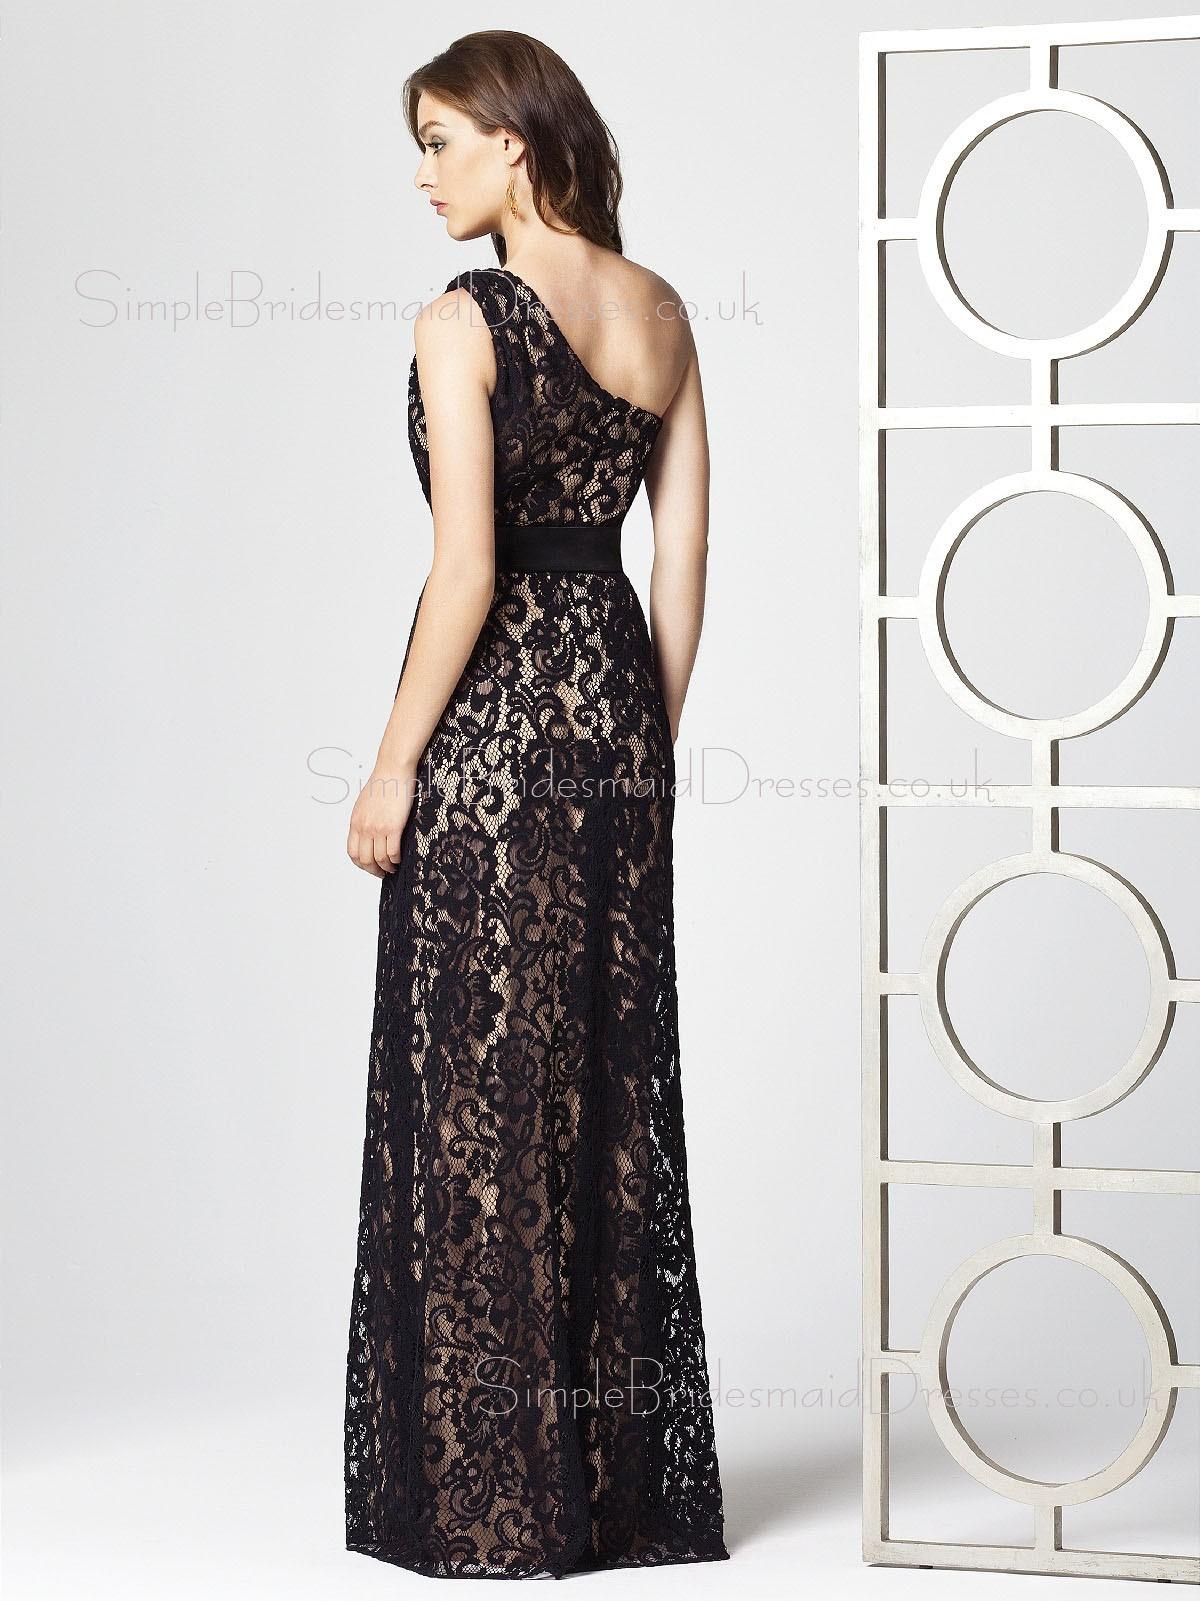 Sleeveless Black Sash A line e Shoulder Bridesmaid Dress